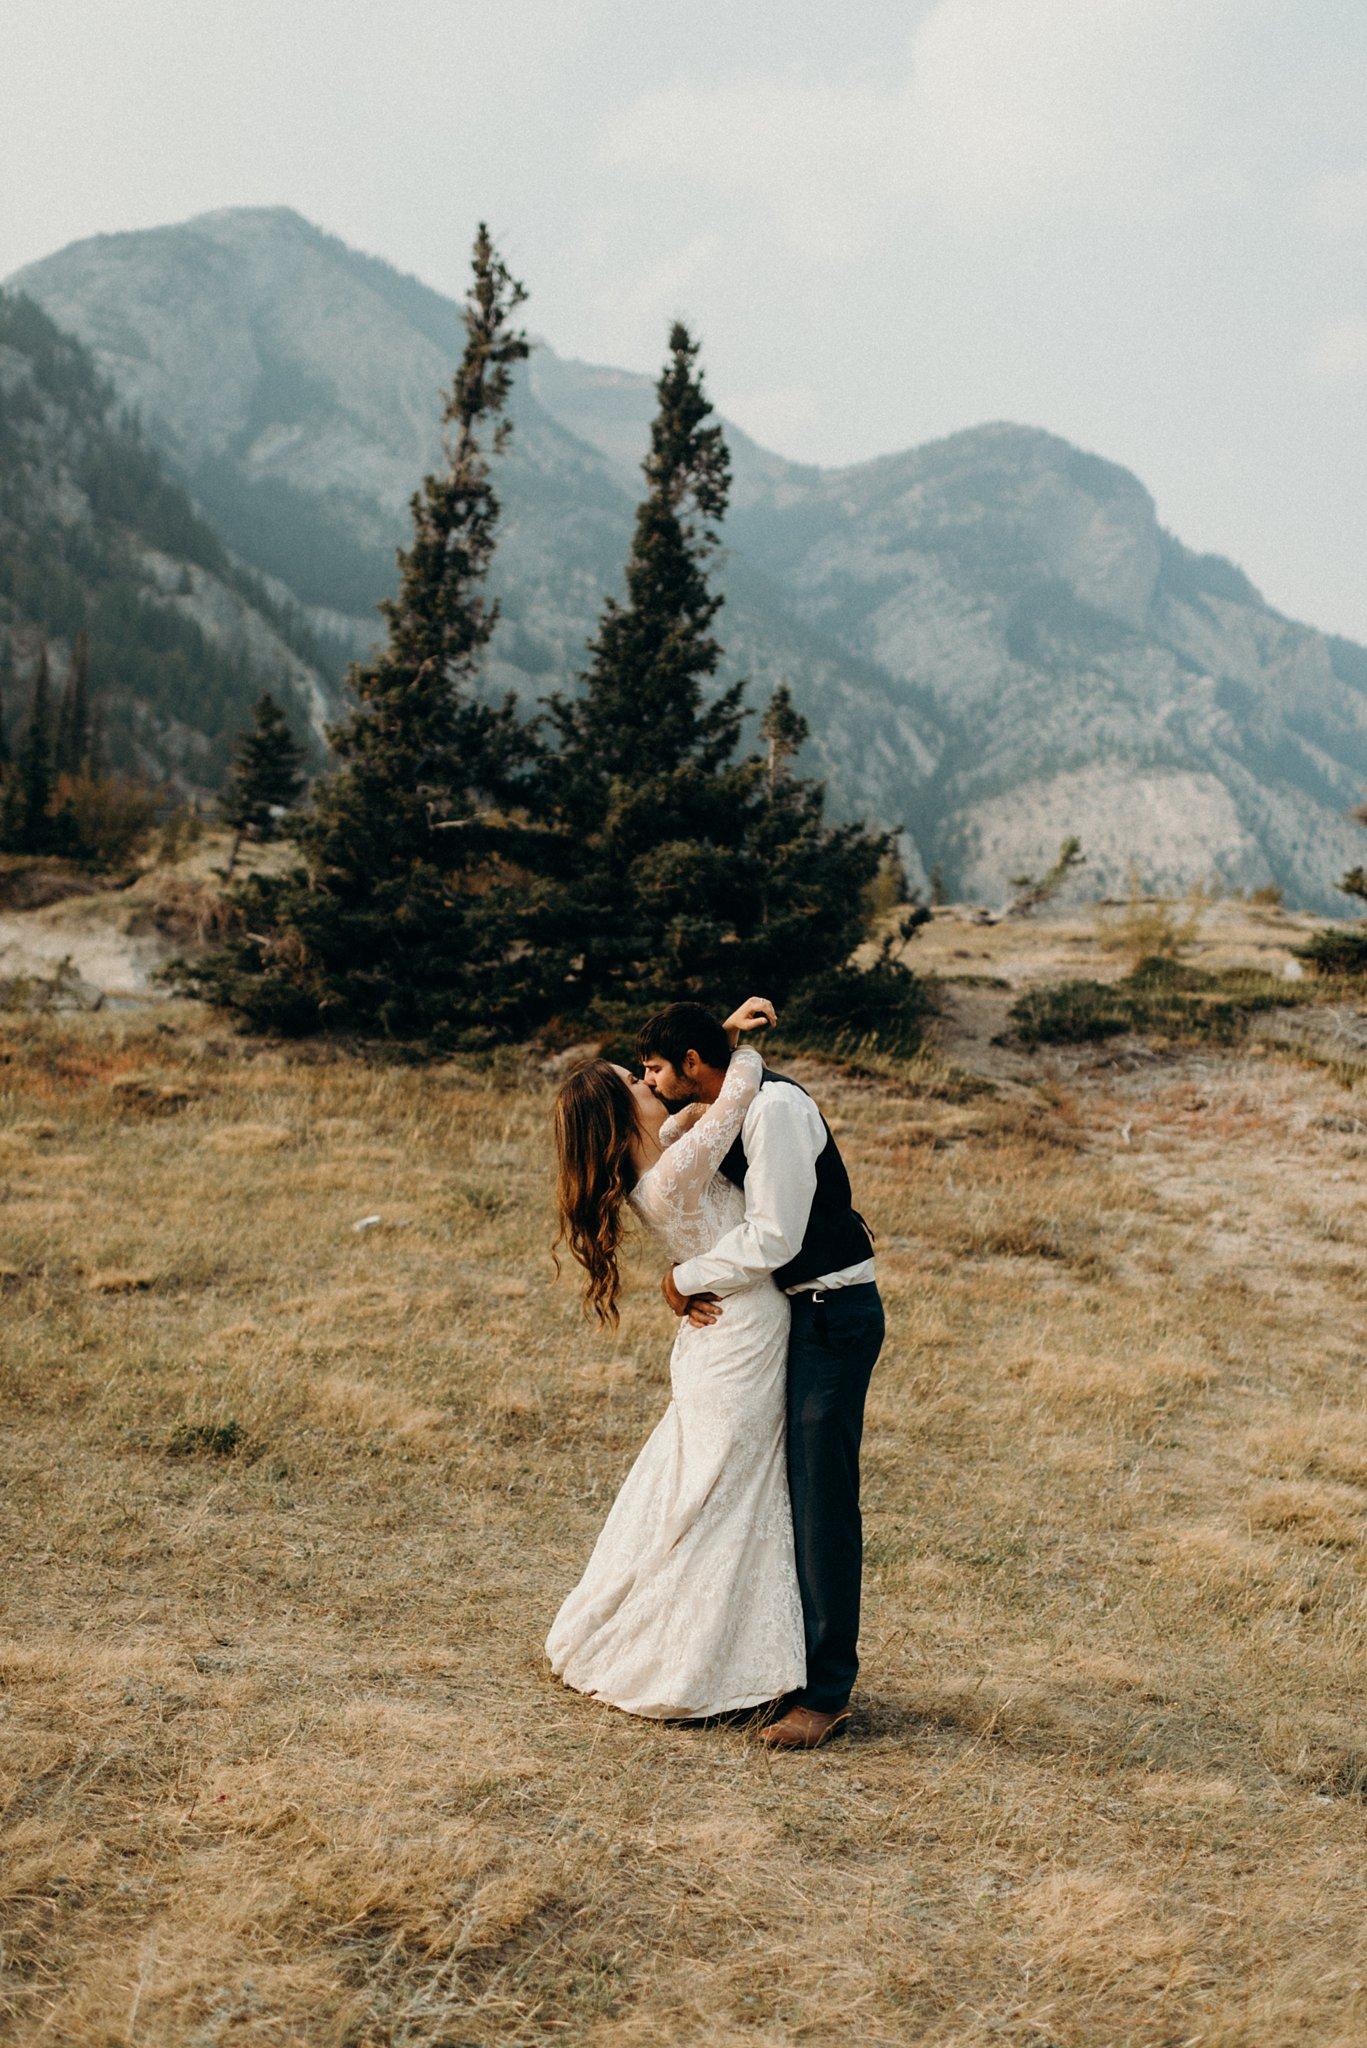 kaihla_tonai_intimate_wedding_elopement_photographer_6758.jpg